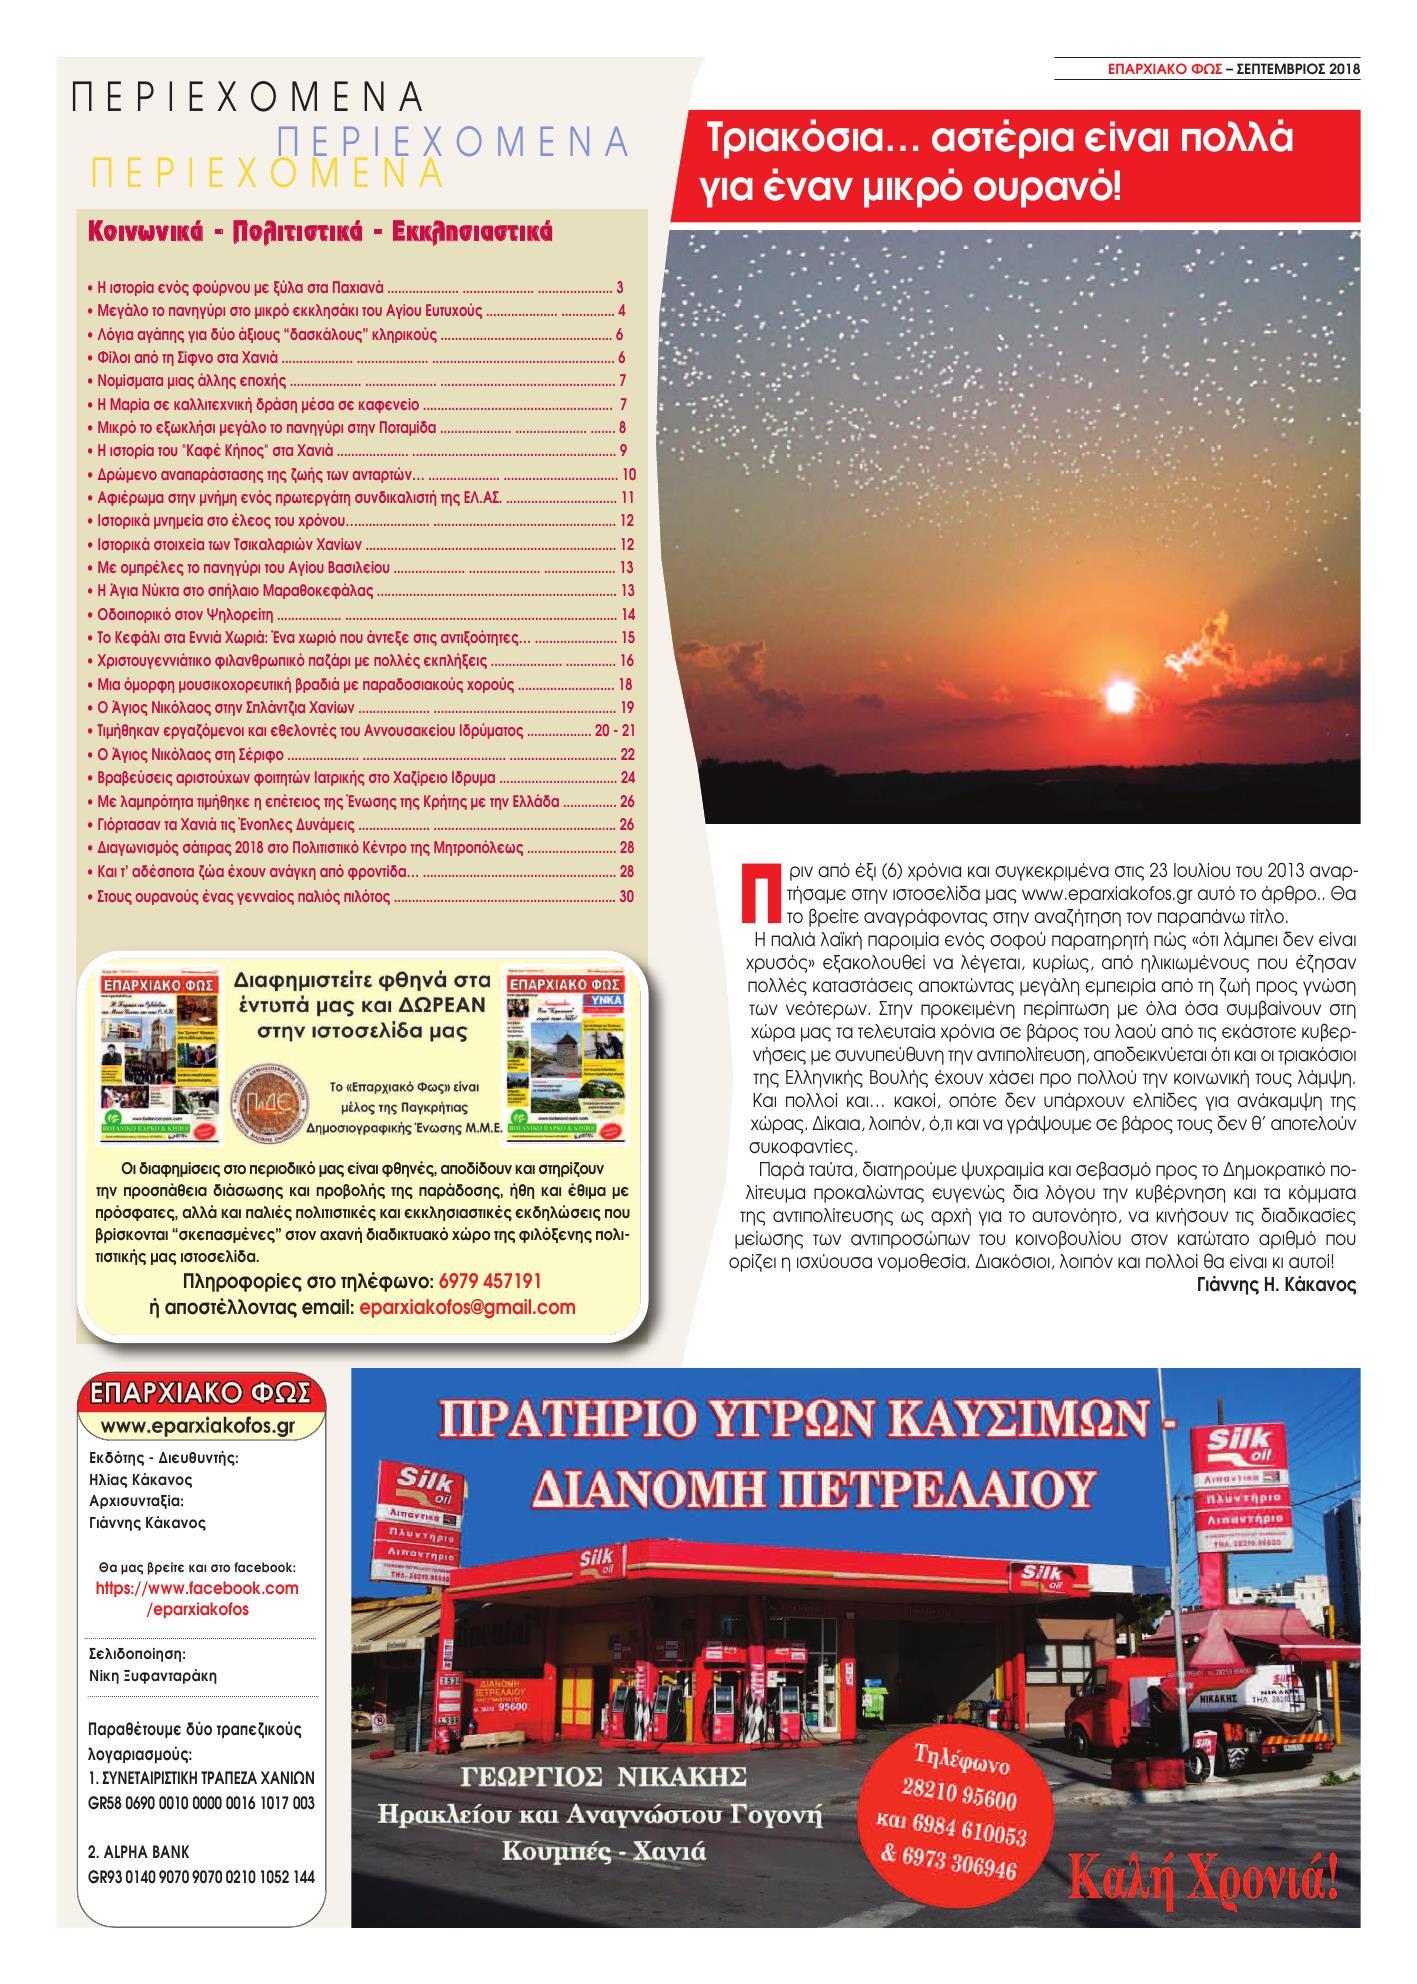 23 KAKANOULHS (Page 02)